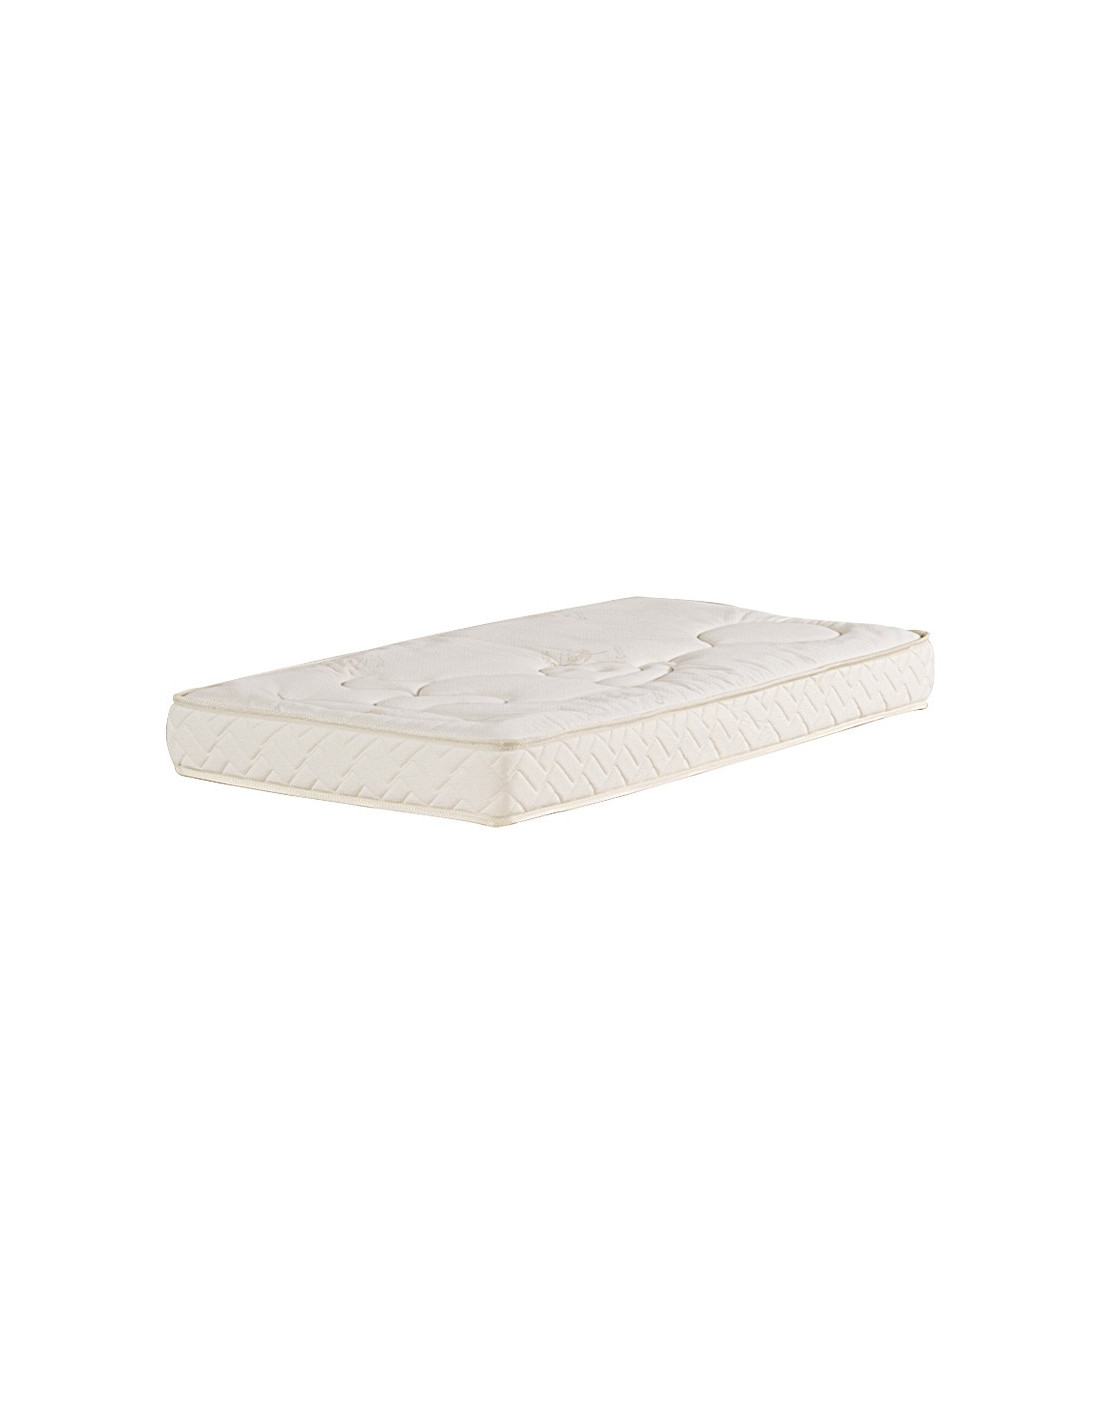 matelas bb naturel affordable with matelas bb naturel affordable clair de lune duorge bb. Black Bedroom Furniture Sets. Home Design Ideas